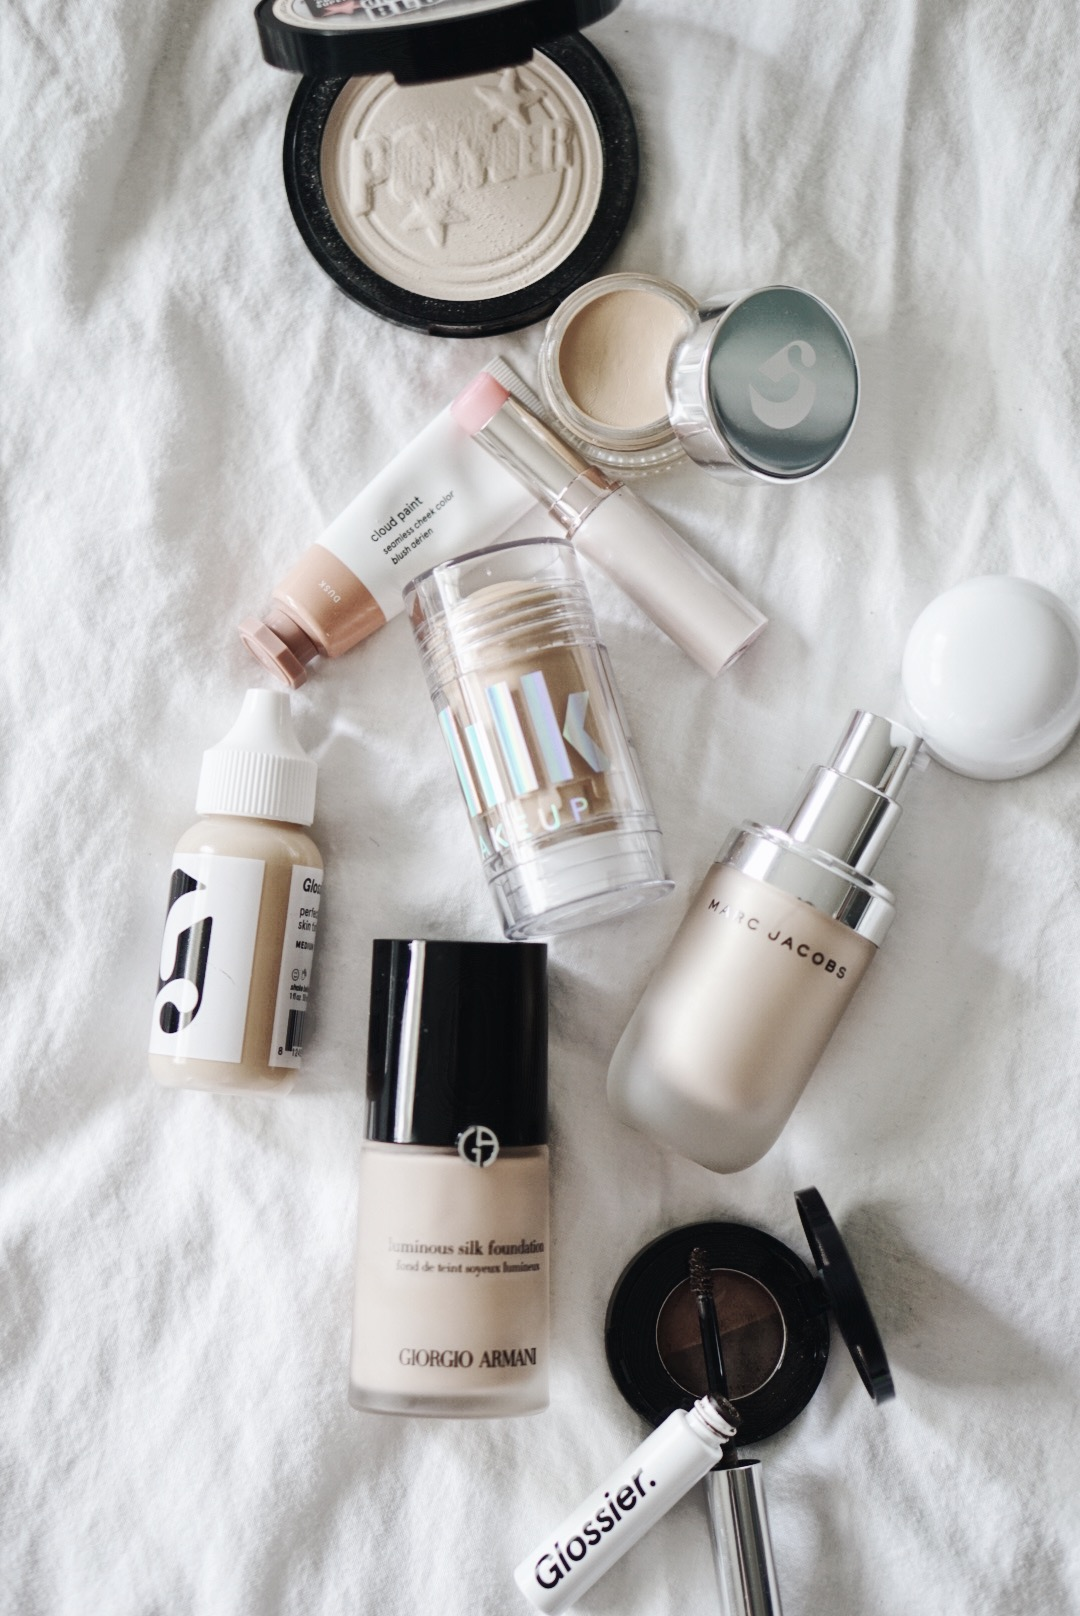 makeup-edit-soapandglory-milk-makeup-mars-glossier-cloud-paint-marc-jacobs-beauty-giorgio-armani-anastasia-beverly-hills